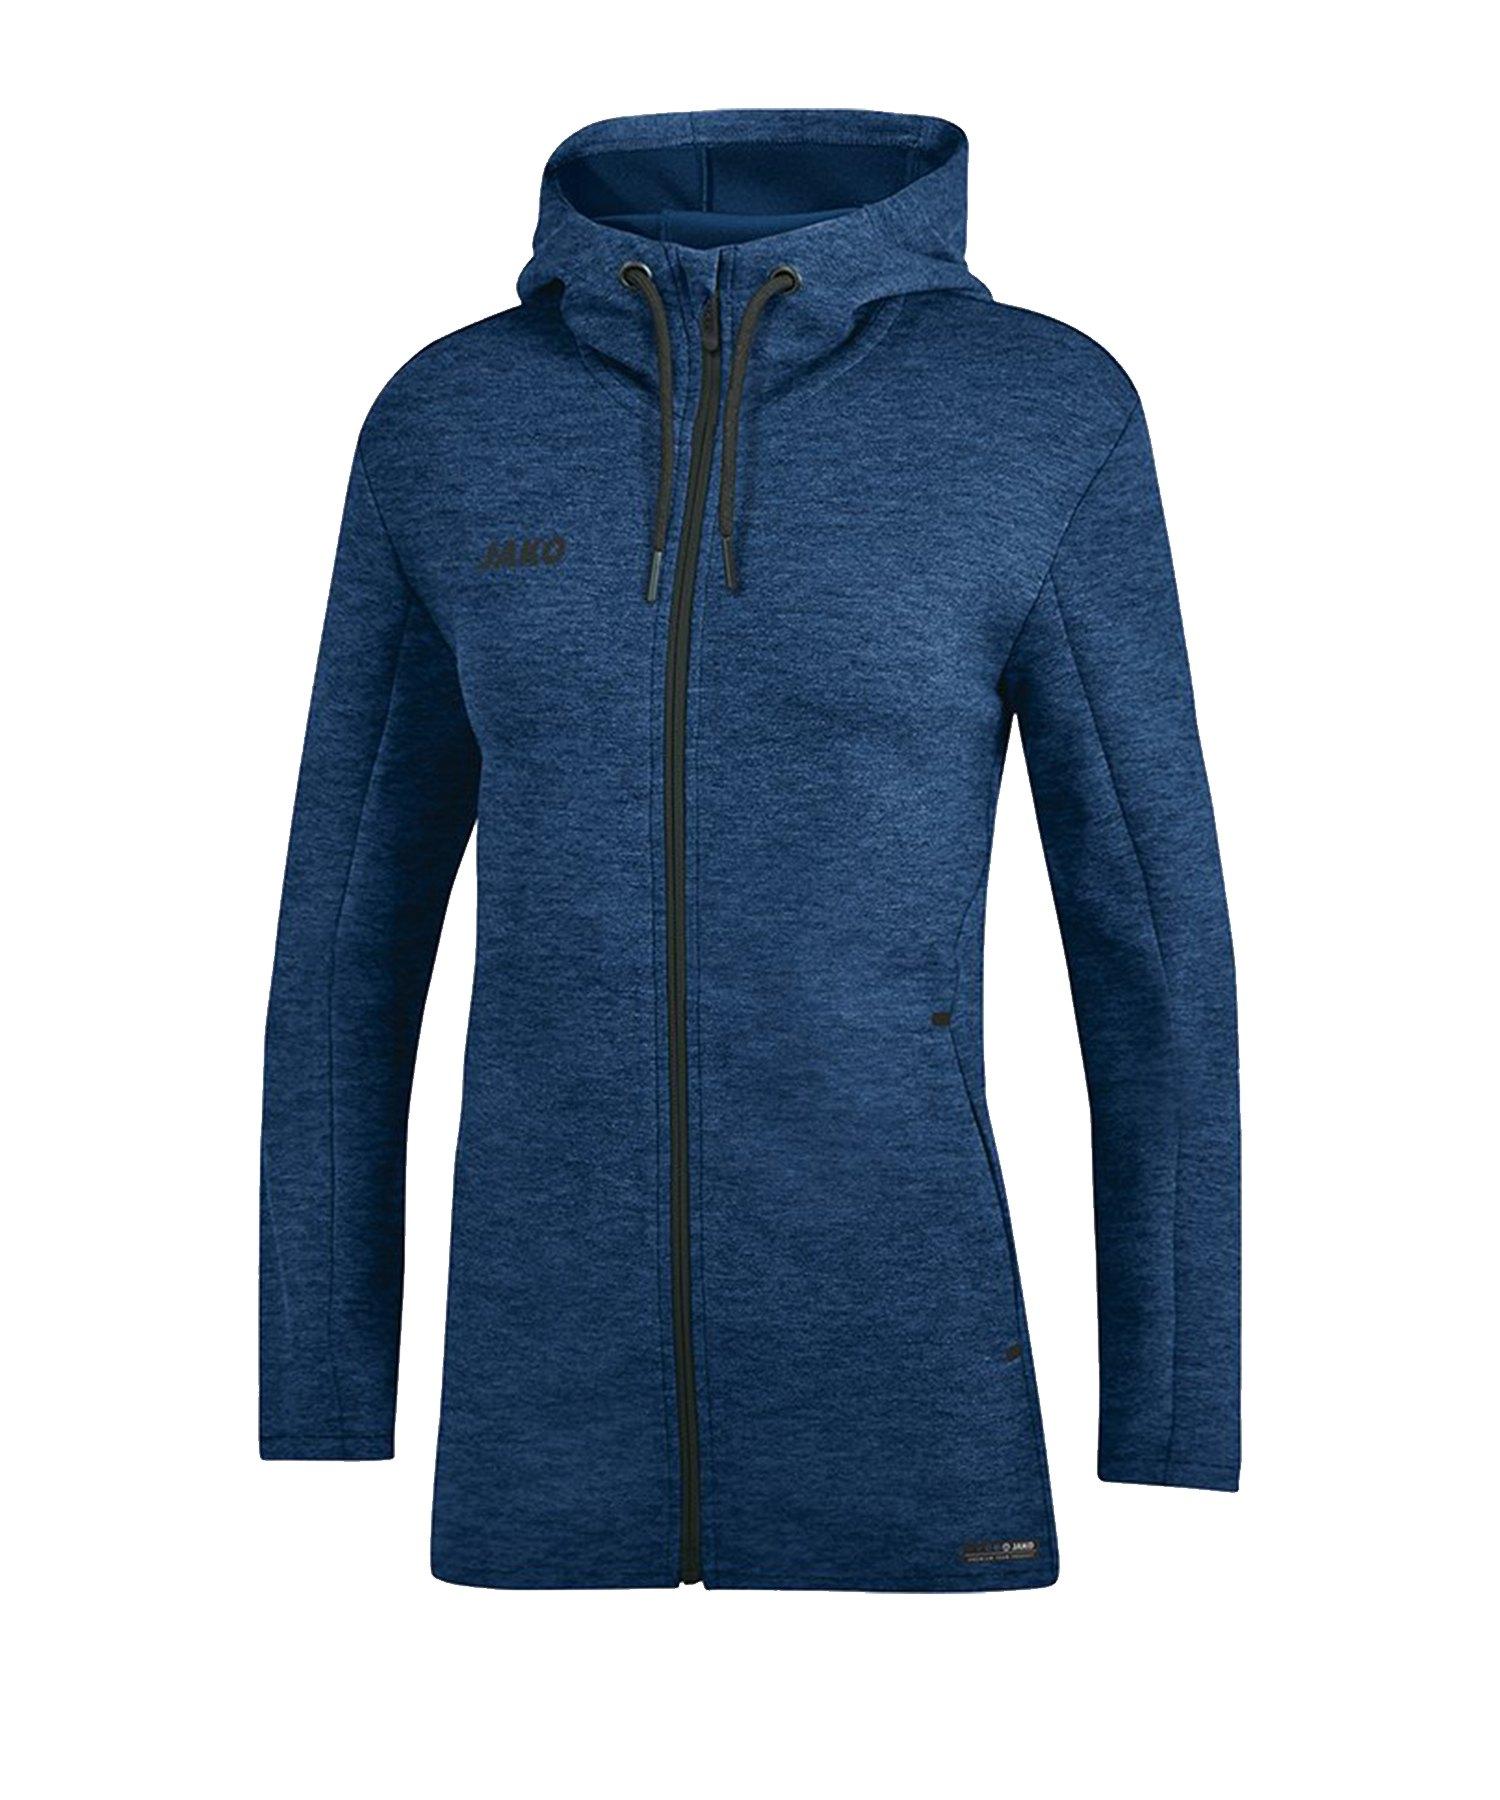 Jako Premium Basic Kapuzenjacke Damen Blau F49 - blau